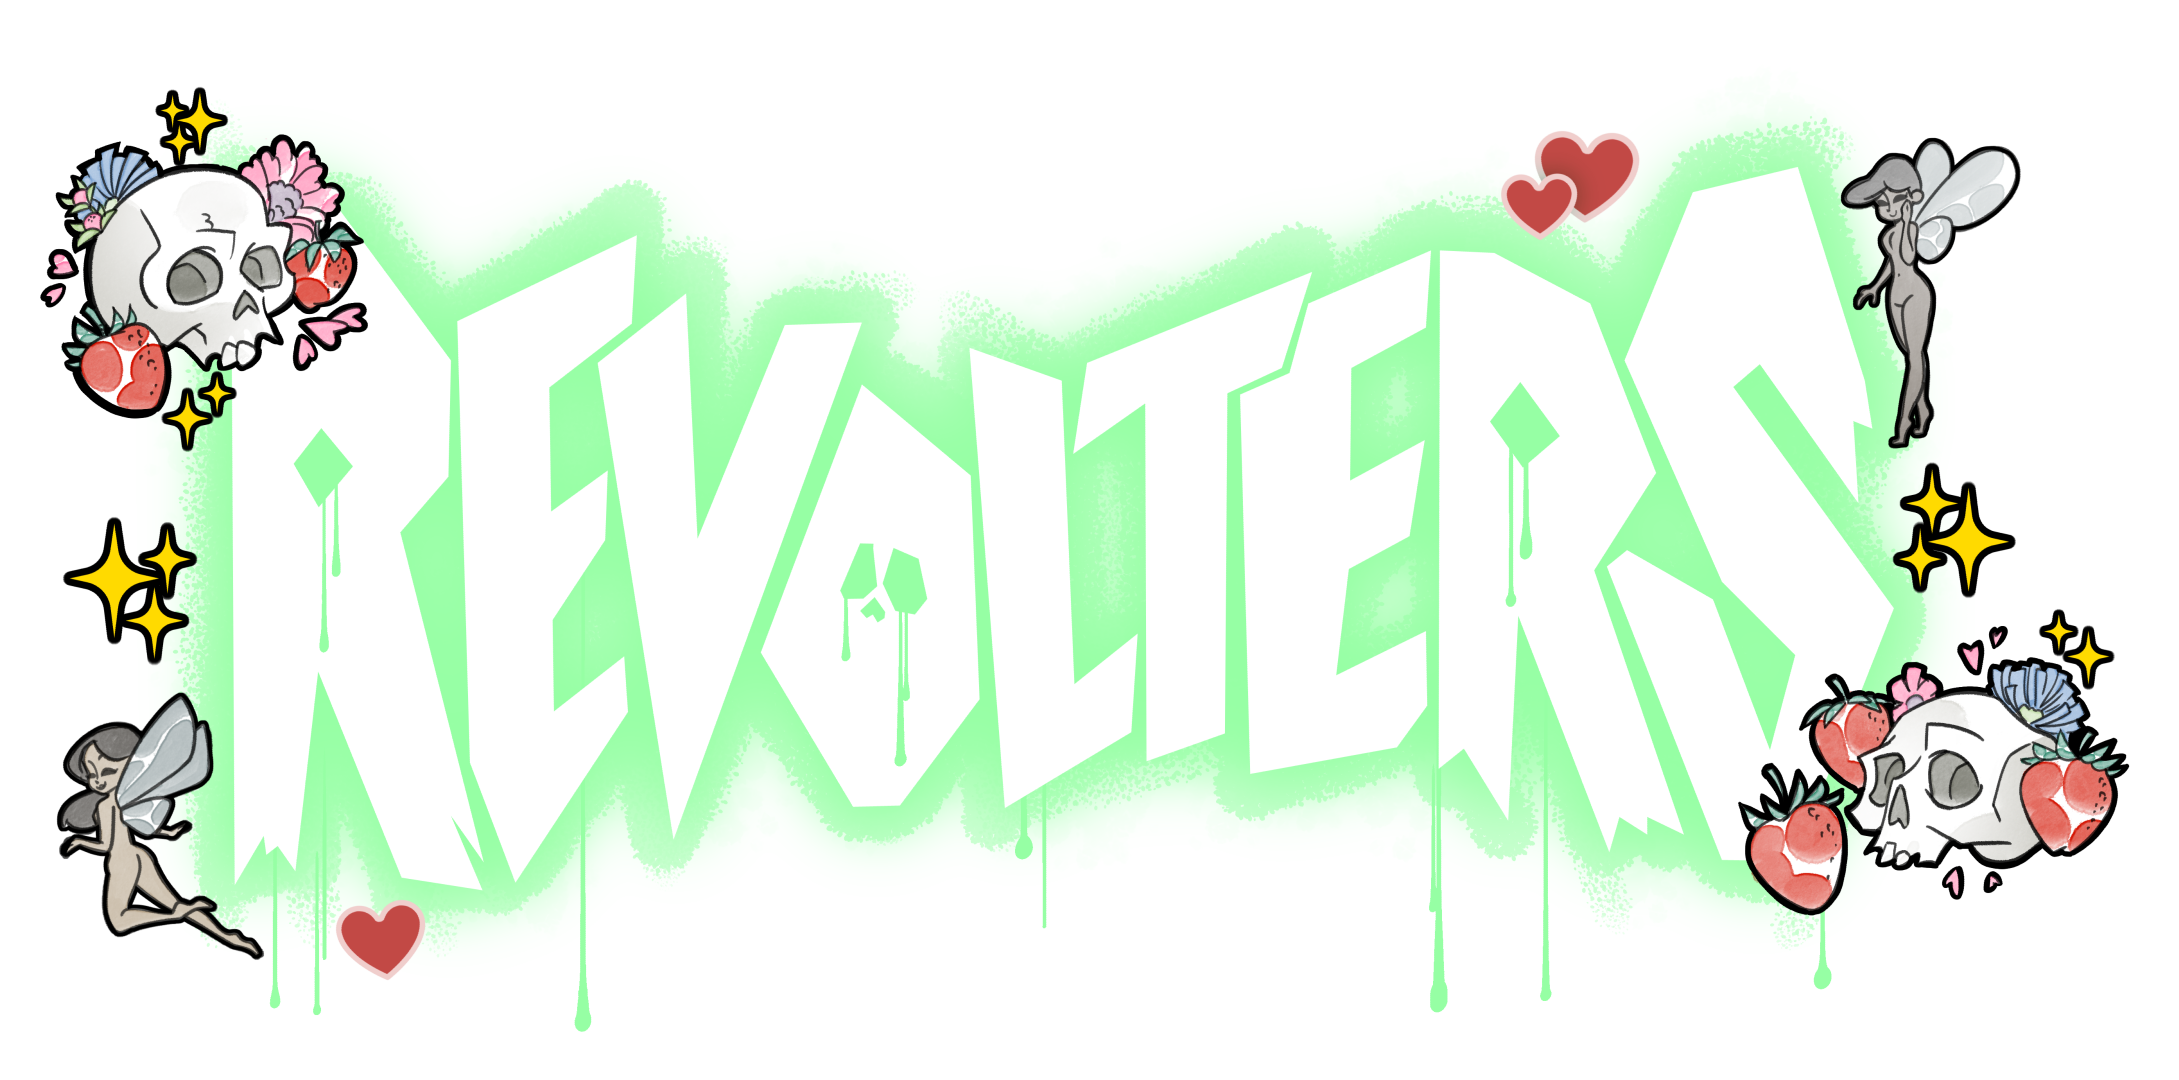 REVOLTERS